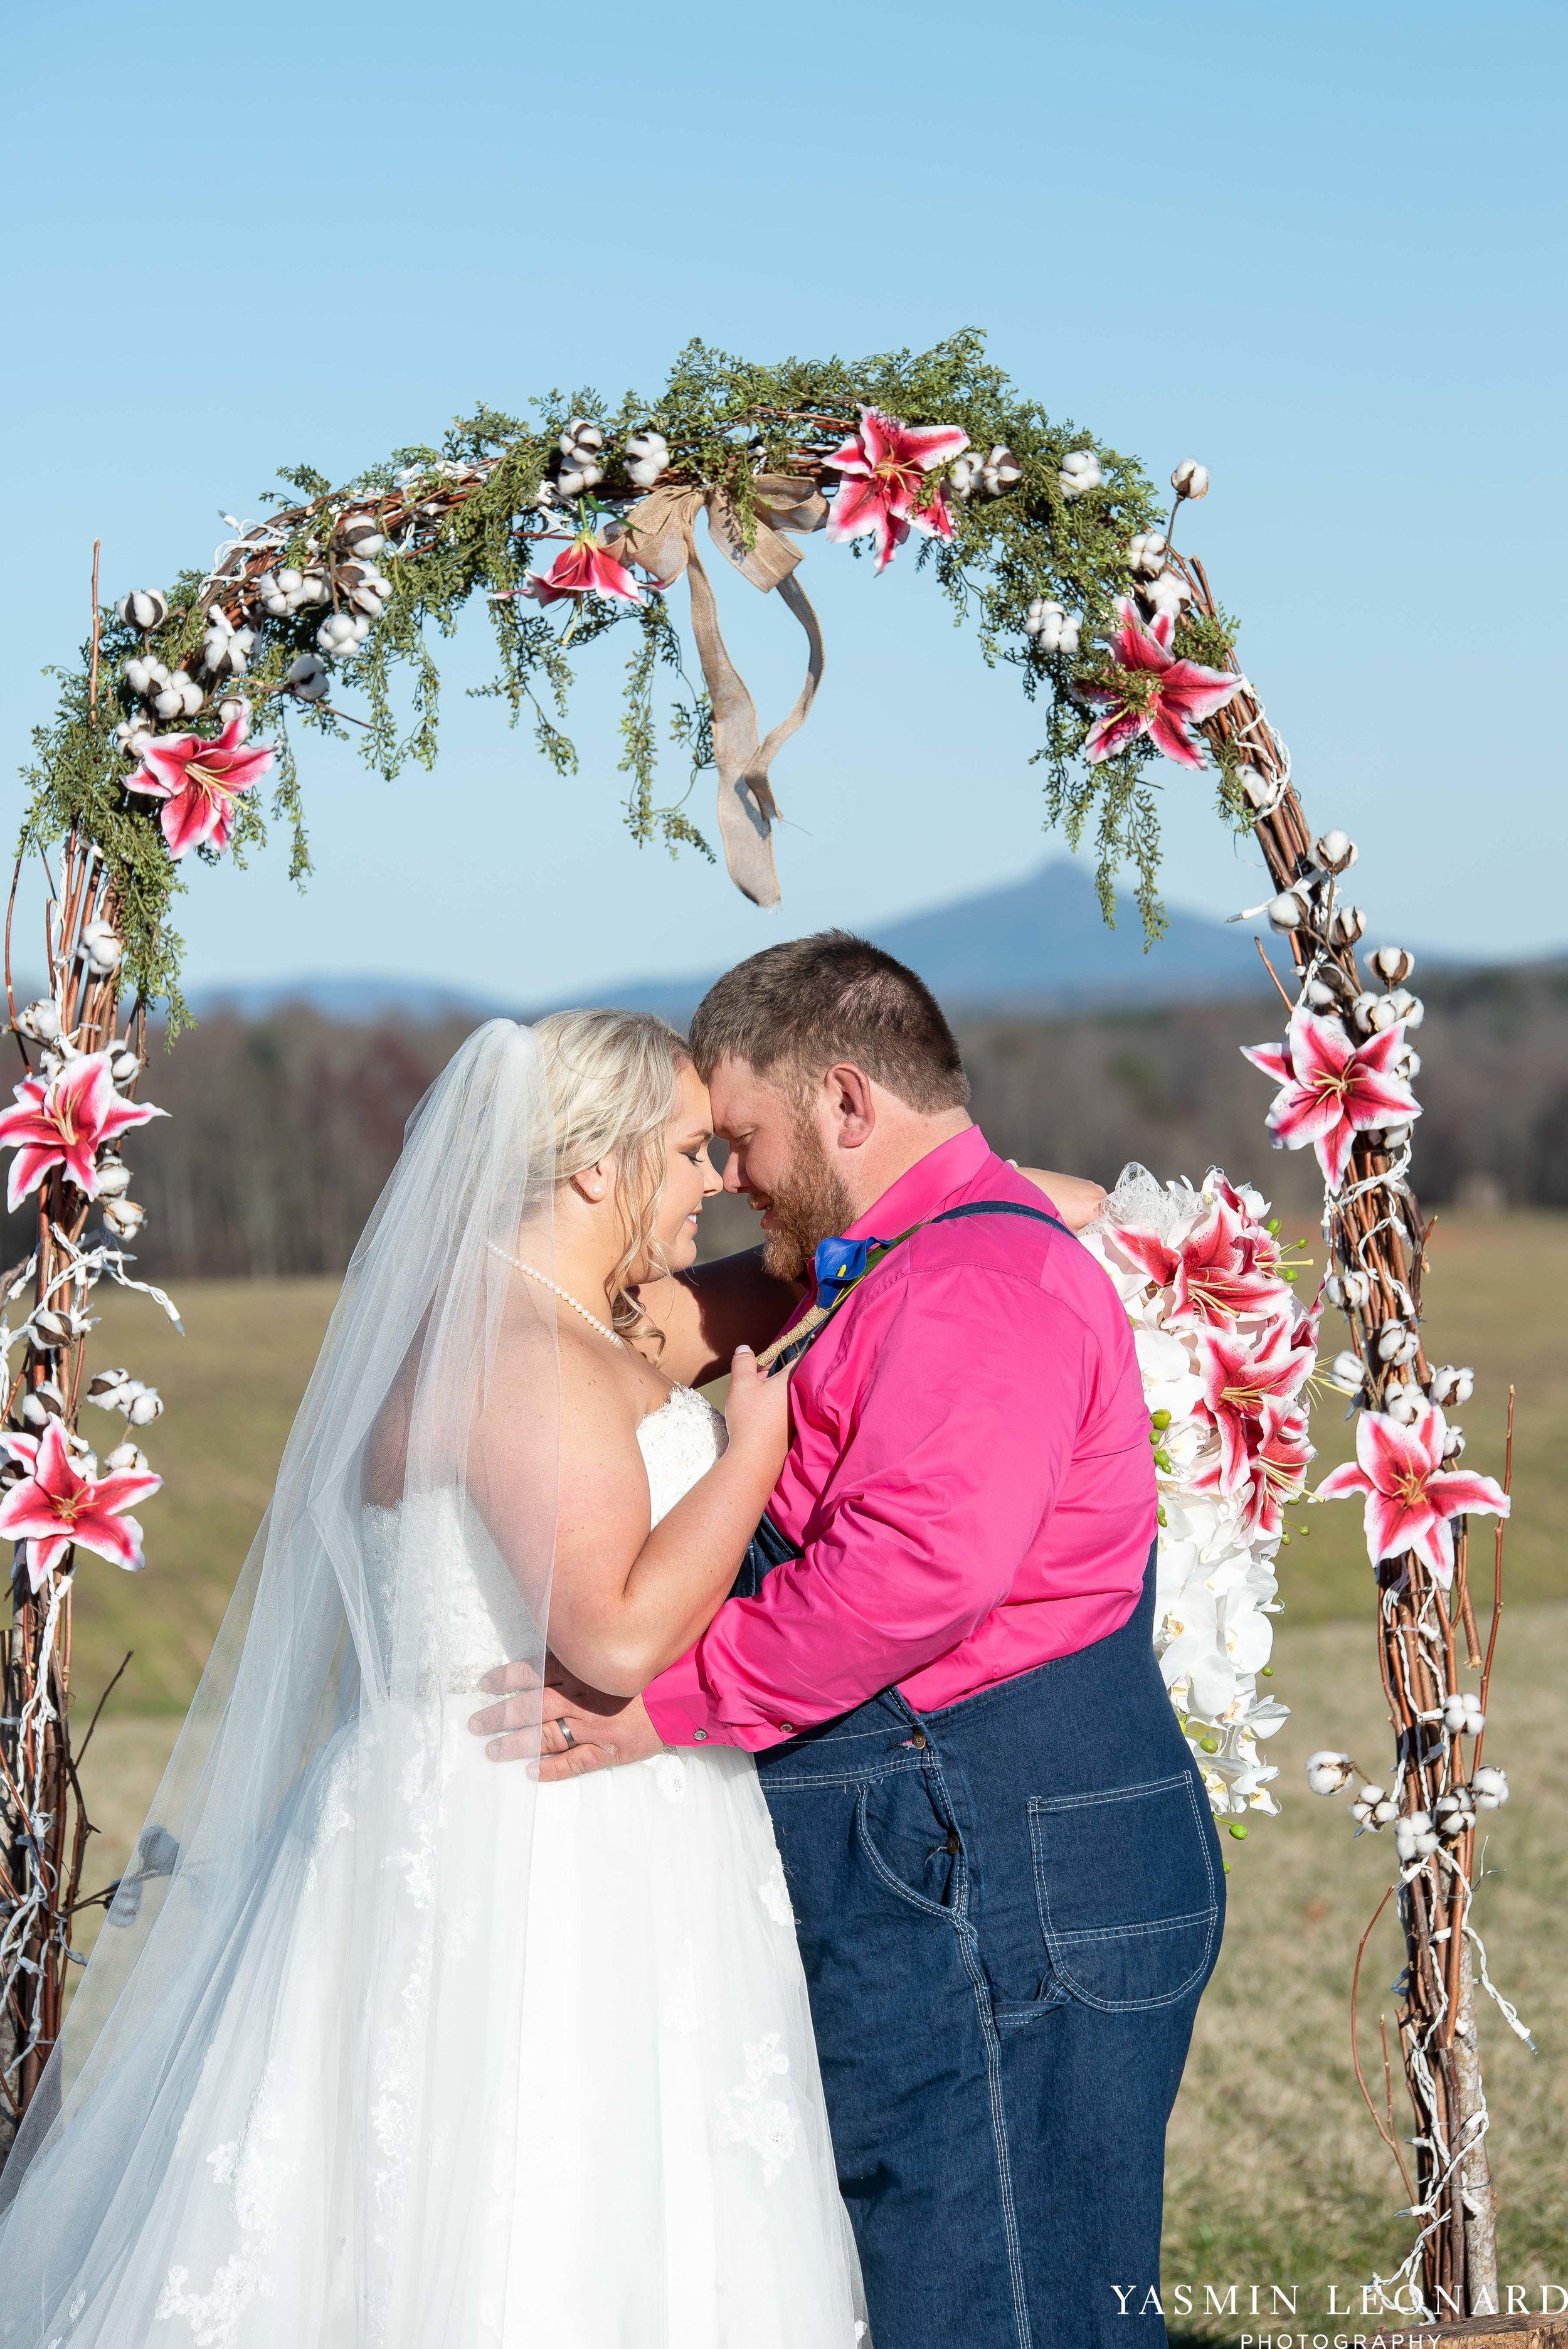 The Barn at Heritage Farm - Country Wedding - Pink and Blue Wedding - Barn Wedding - Outdoor Wedding - Cotton and Wheat Decor - Groom in Bibs - Pink Bridal Colors - Yasmin Leonard Photography-19.jpg